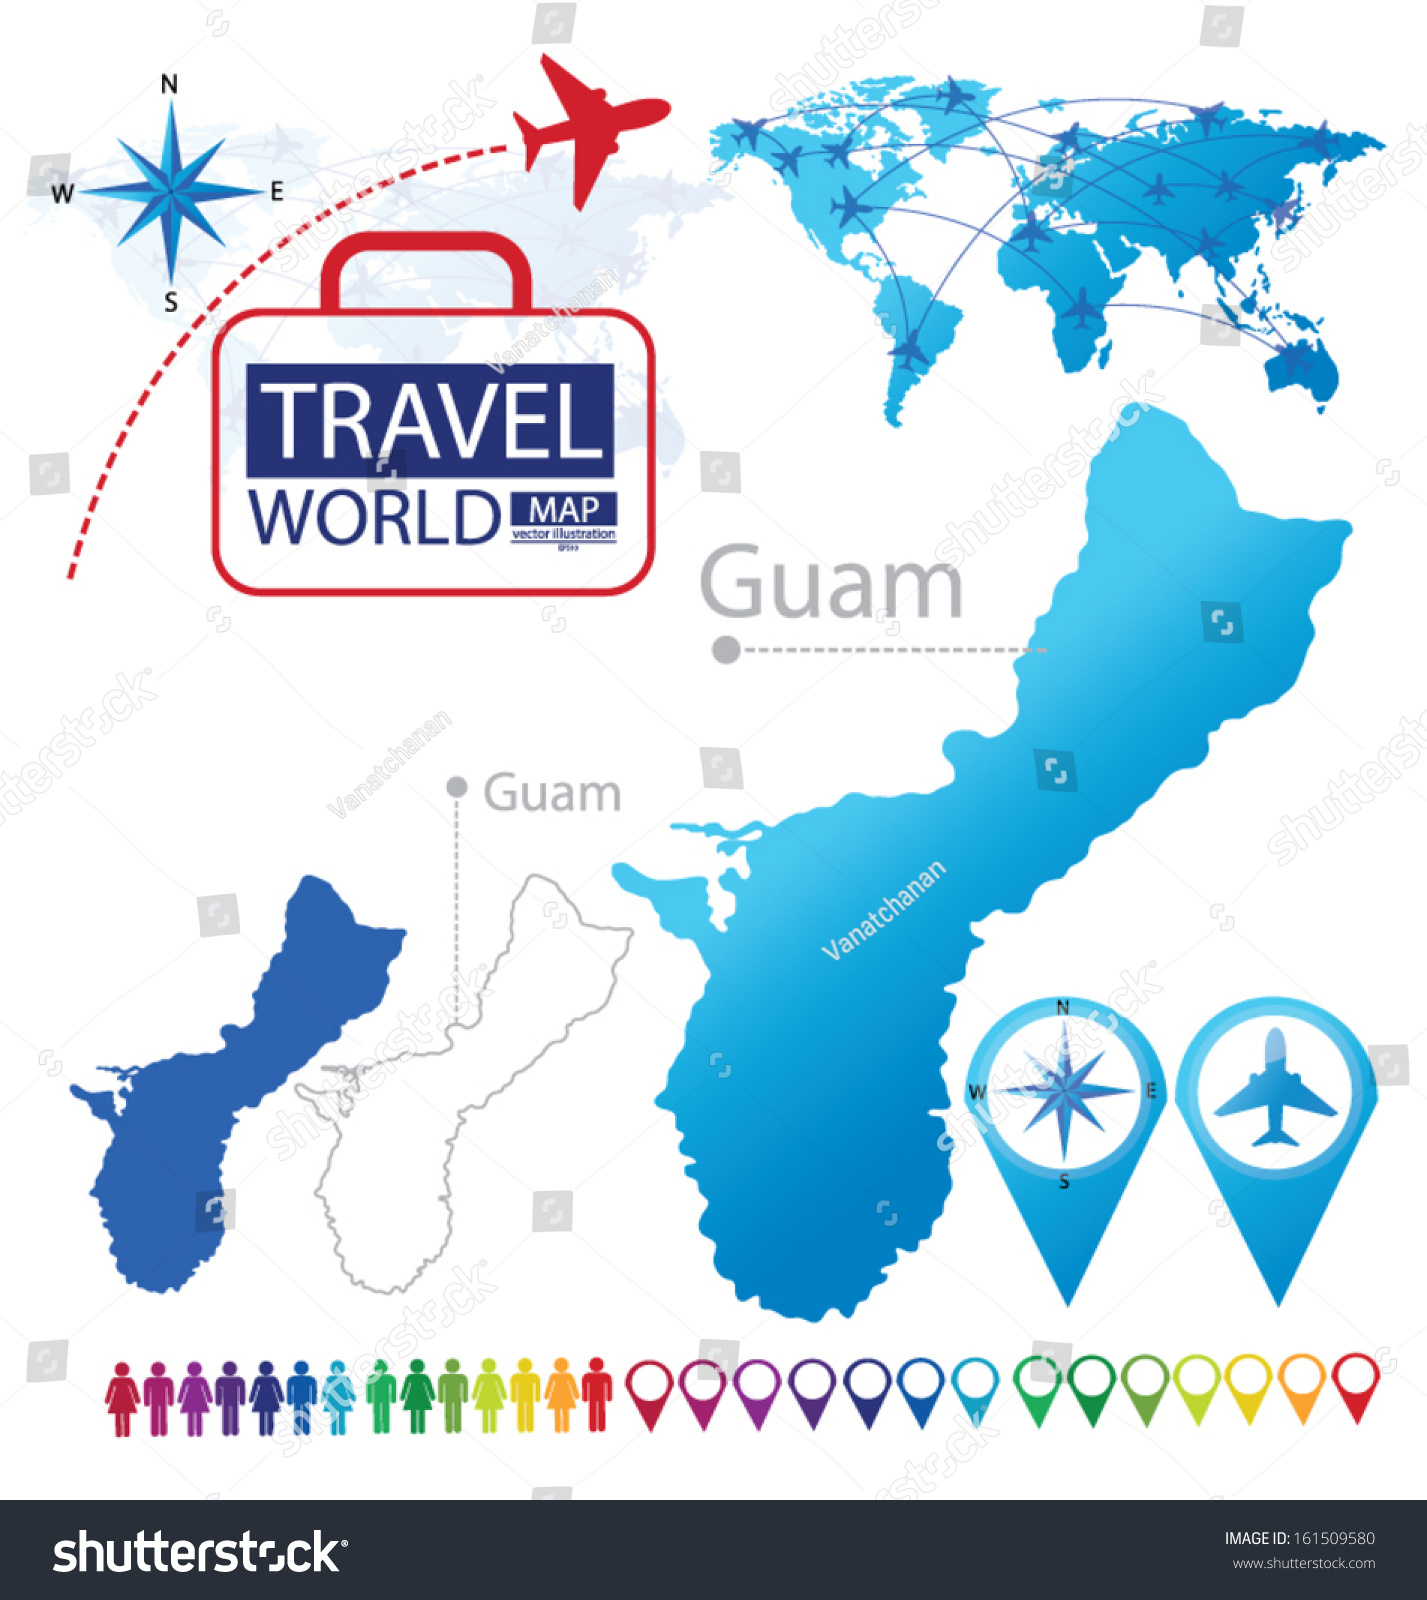 Guam world map travel vector illustration stock vector 161509580 guam world map travel vector illustration stock vector 161509580 shutterstock gumiabroncs Images